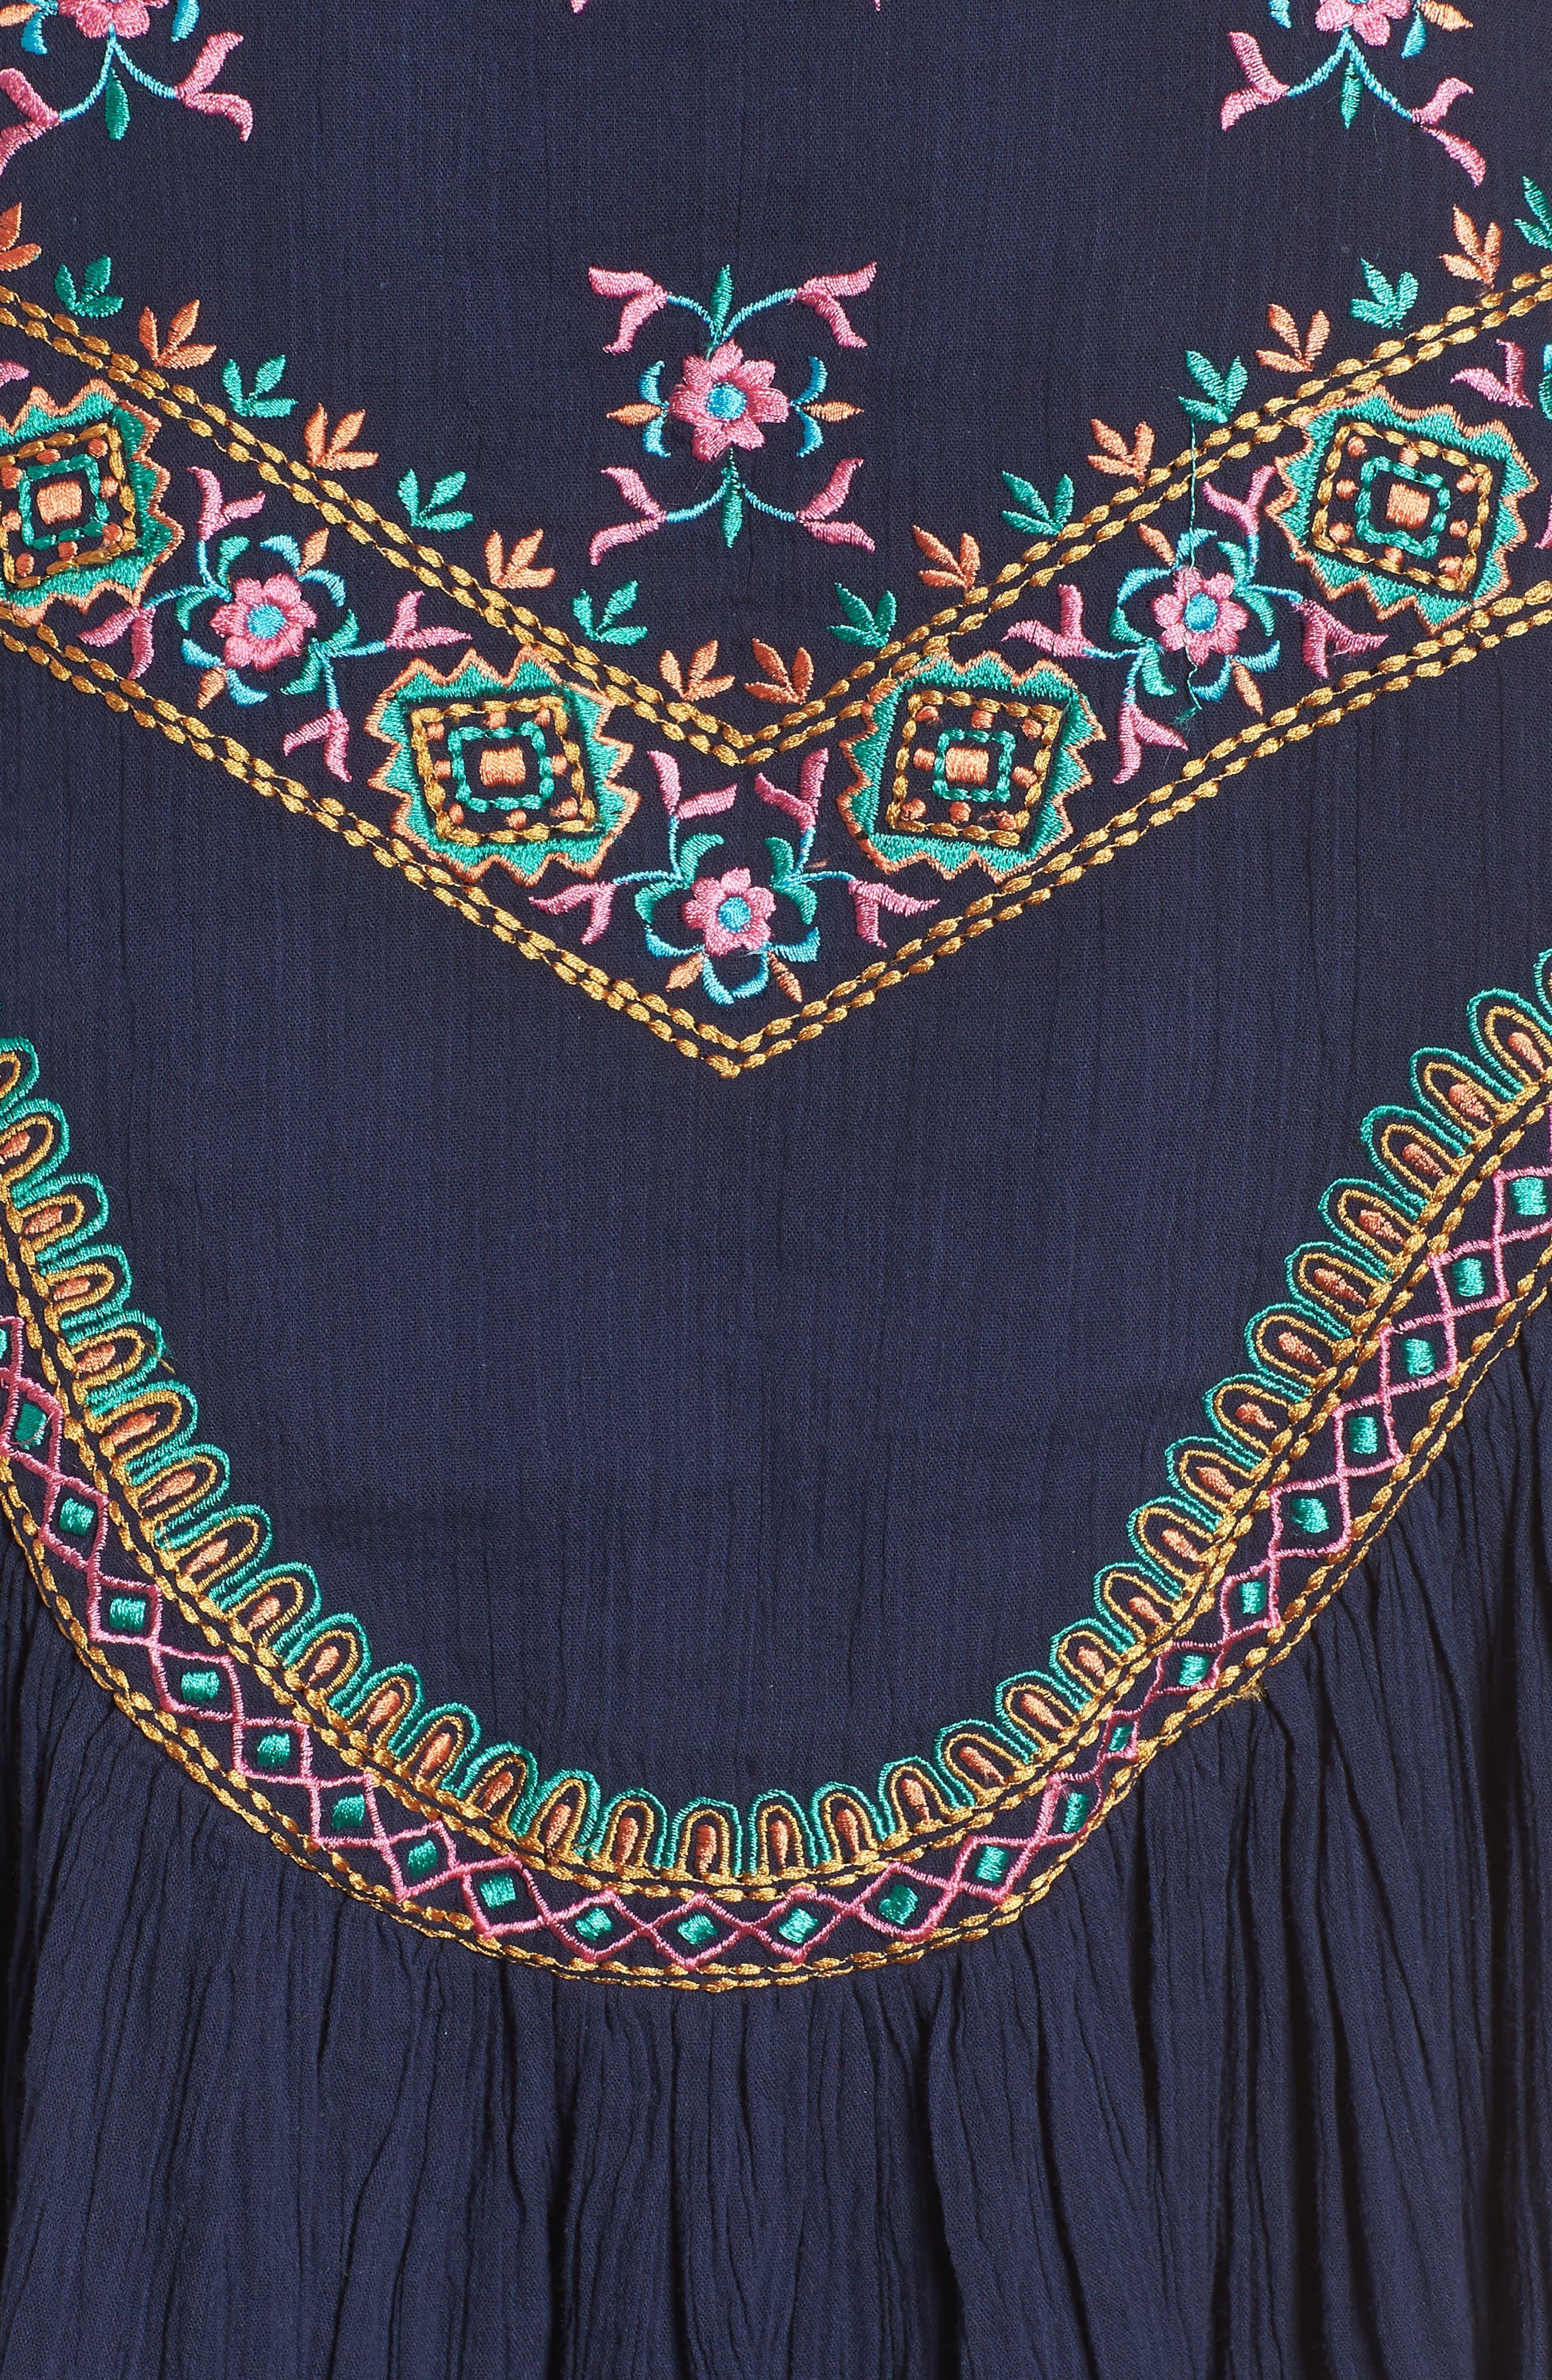 Megan Embroidered Cotton Gauze Blouse,                             Alternate thumbnail 6, color,                             NAVY